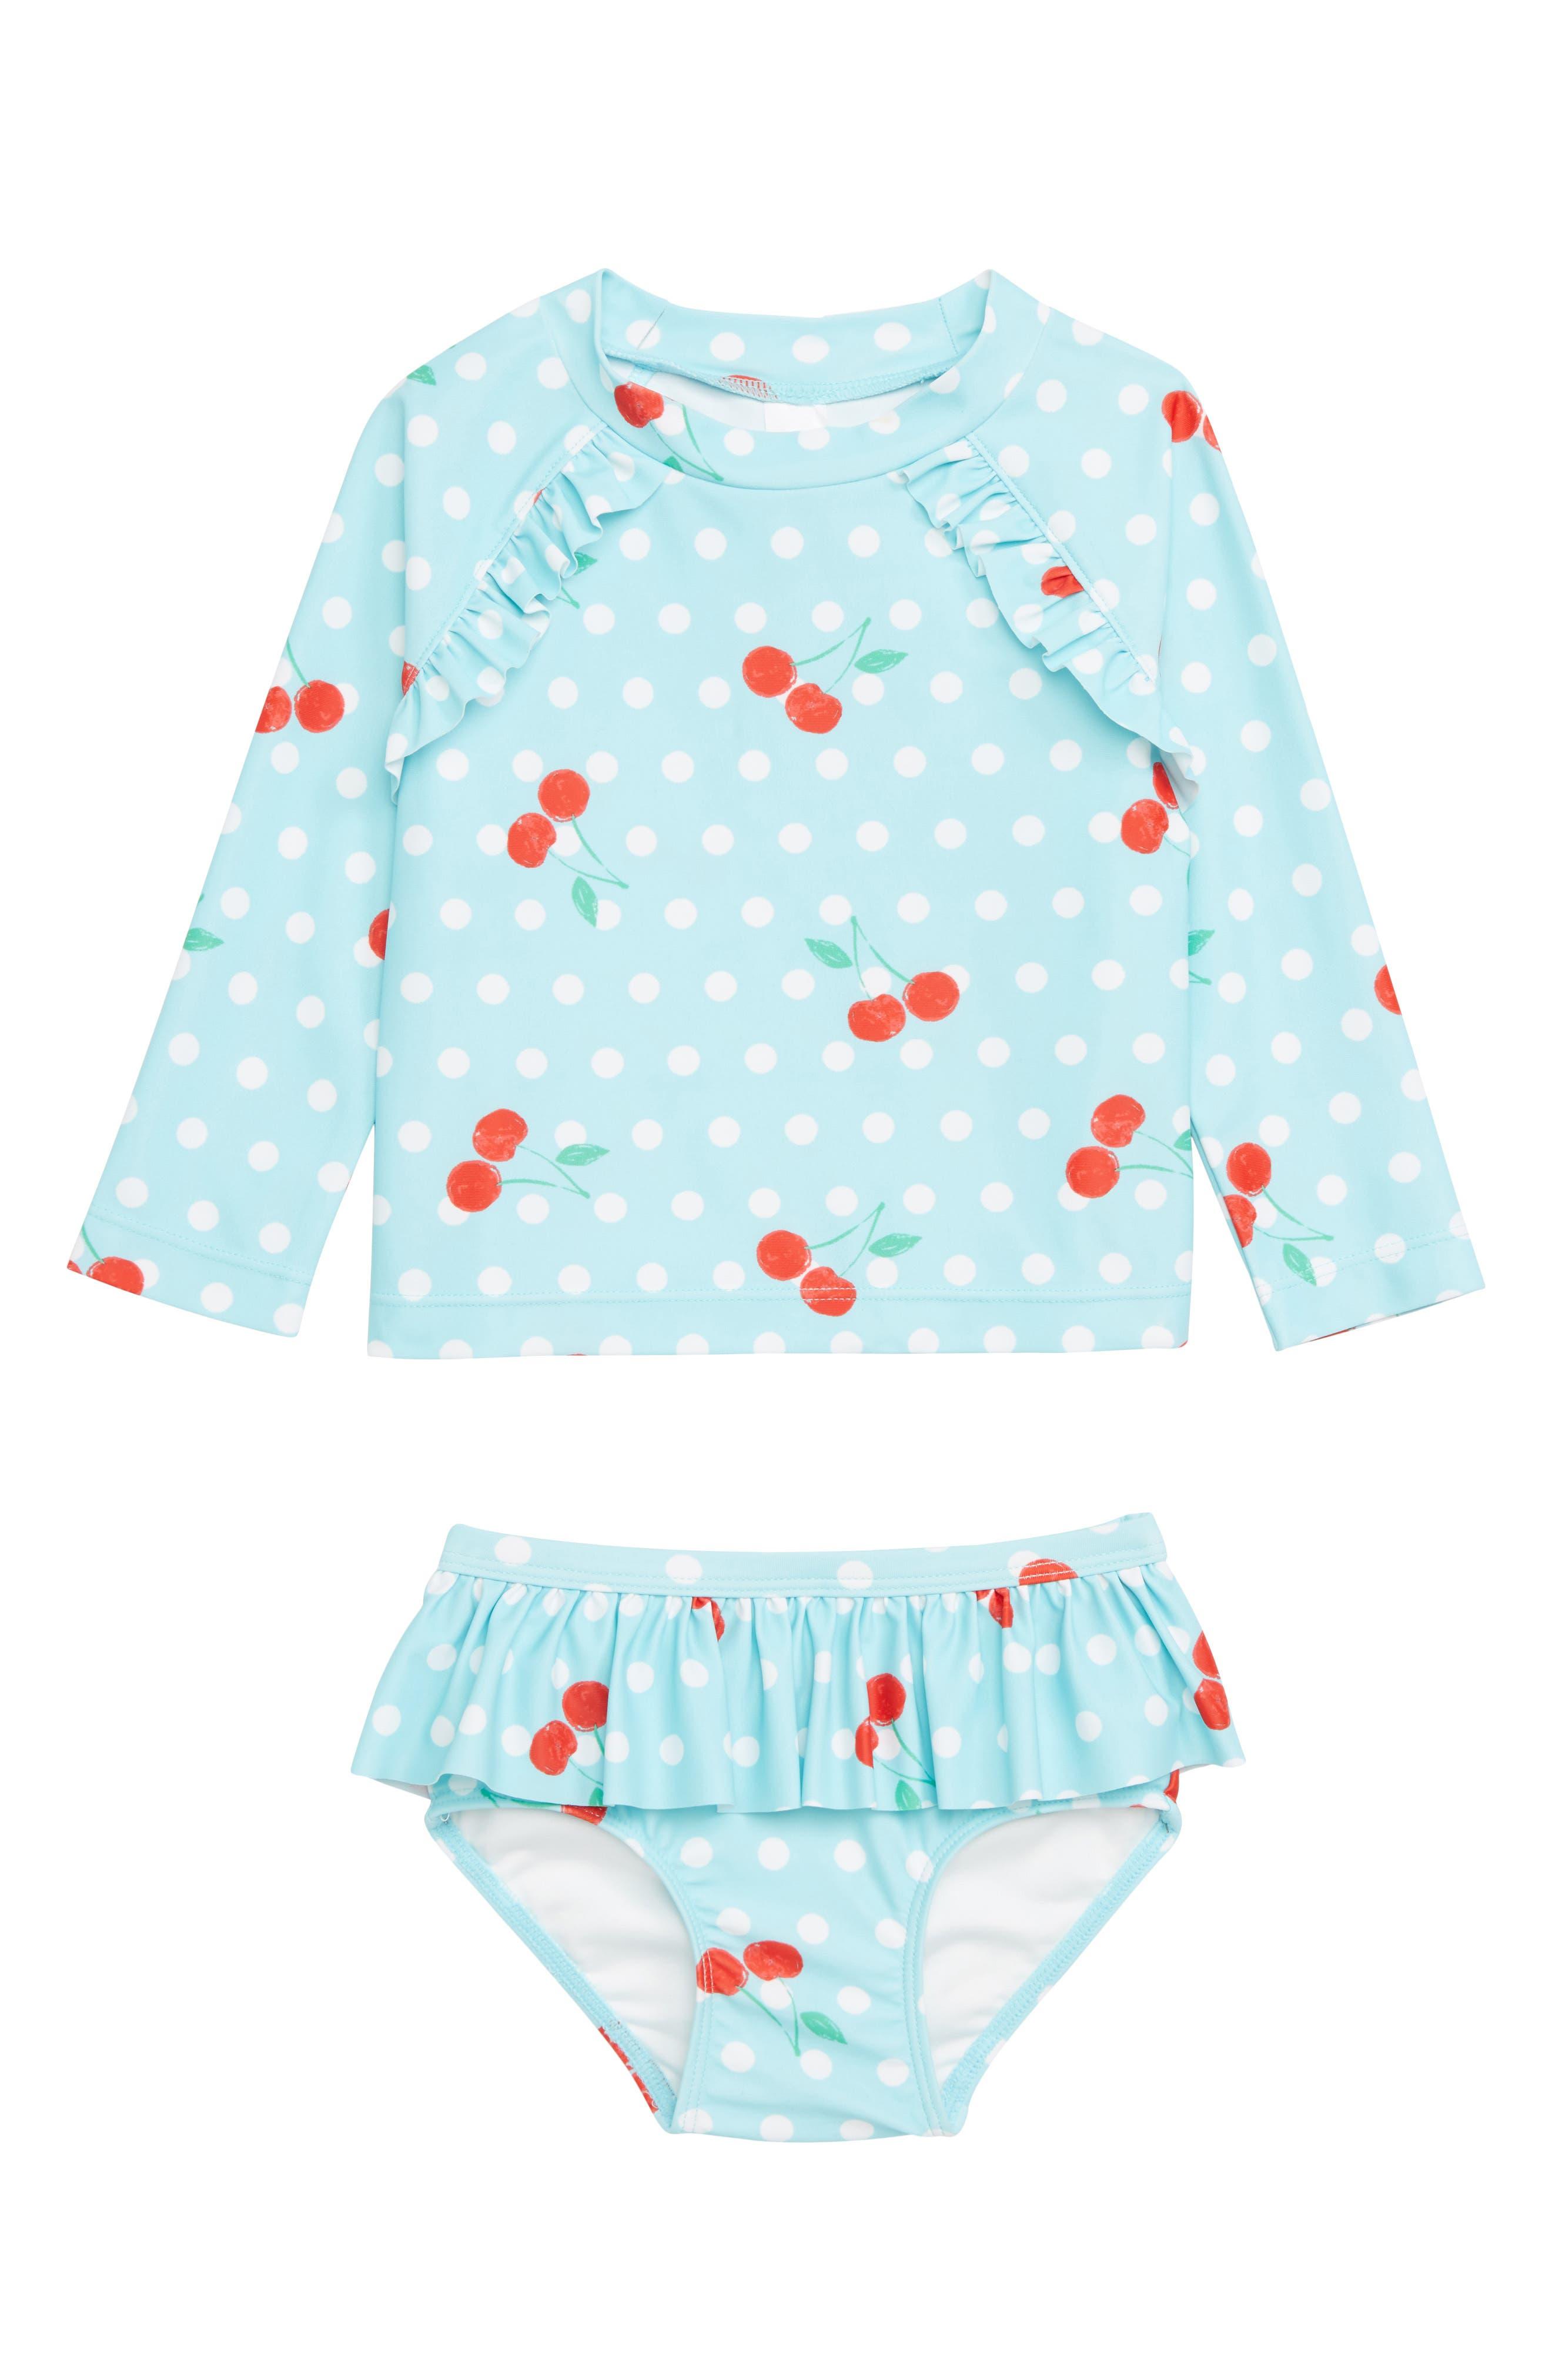 Boys Tucker  Tate TwoPiece Ruffle Rashguard Swimsuit Size 3M  Bluegreen